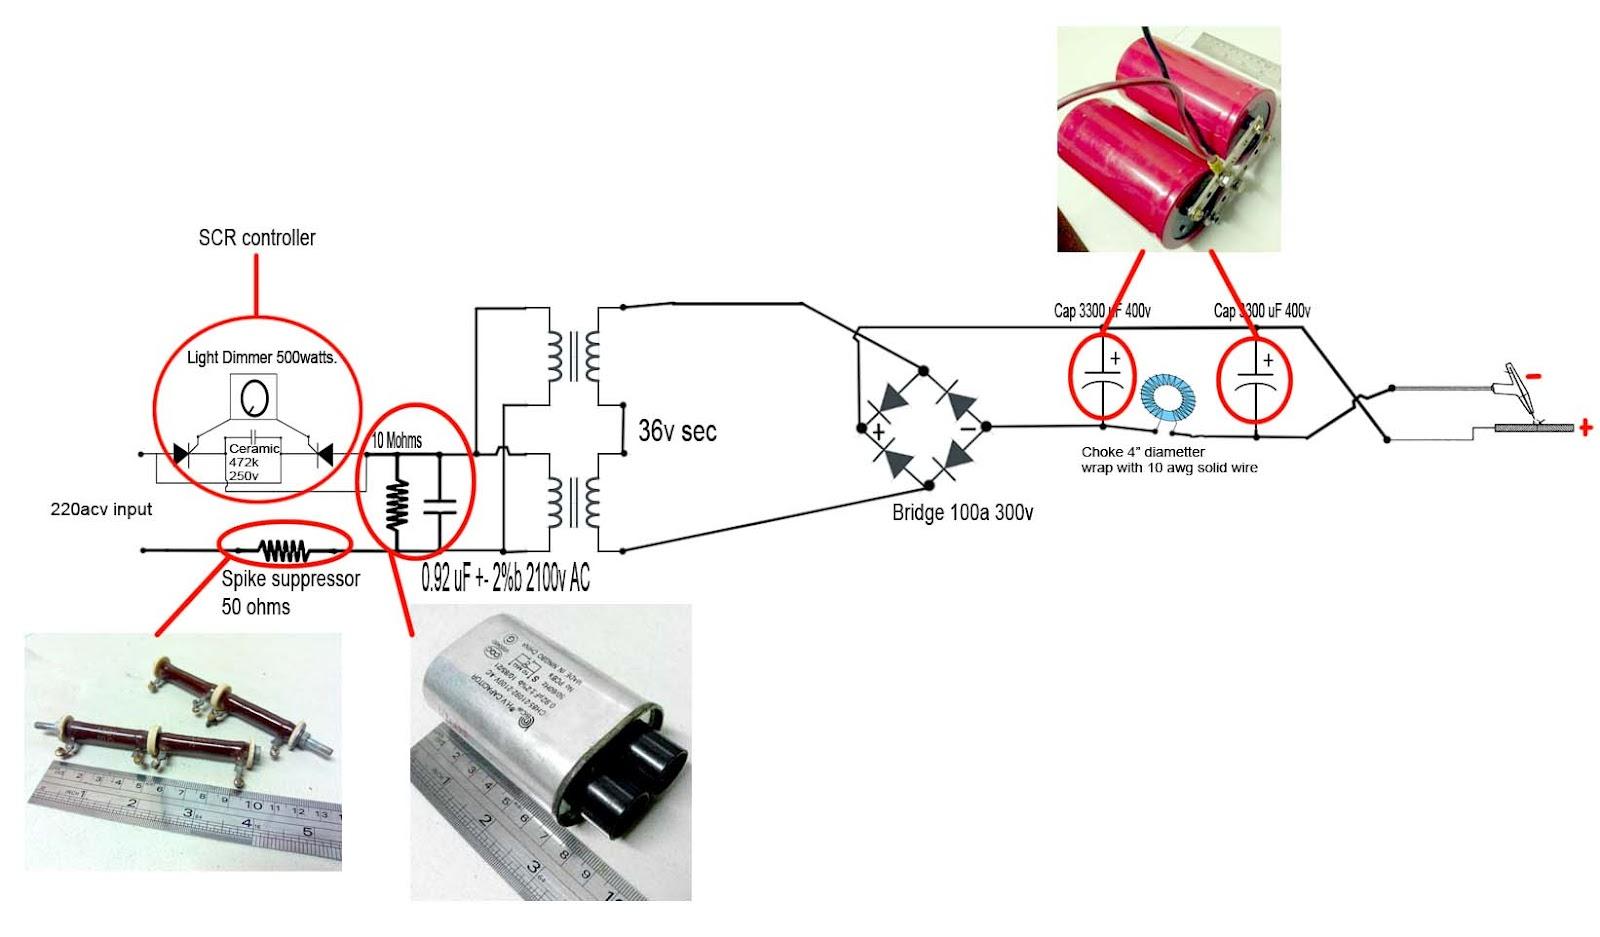 medium resolution of tig schematics and components diy